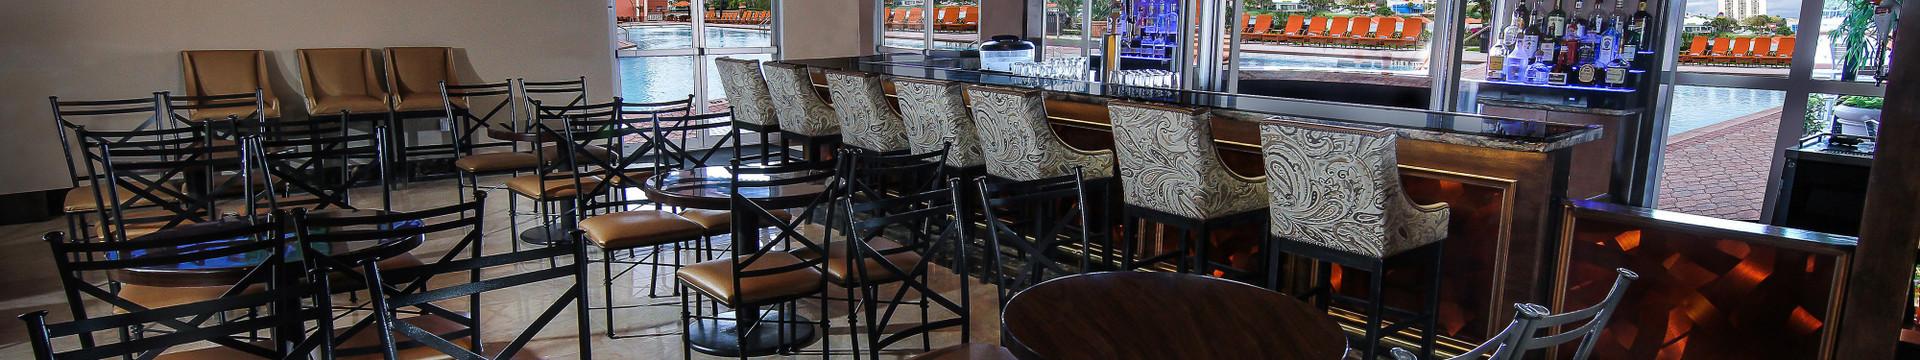 Drafts Sports Bar & Grill Express in Orlando, FL 32819   Sports Bars Near International Drive   Westgate Palace Resort